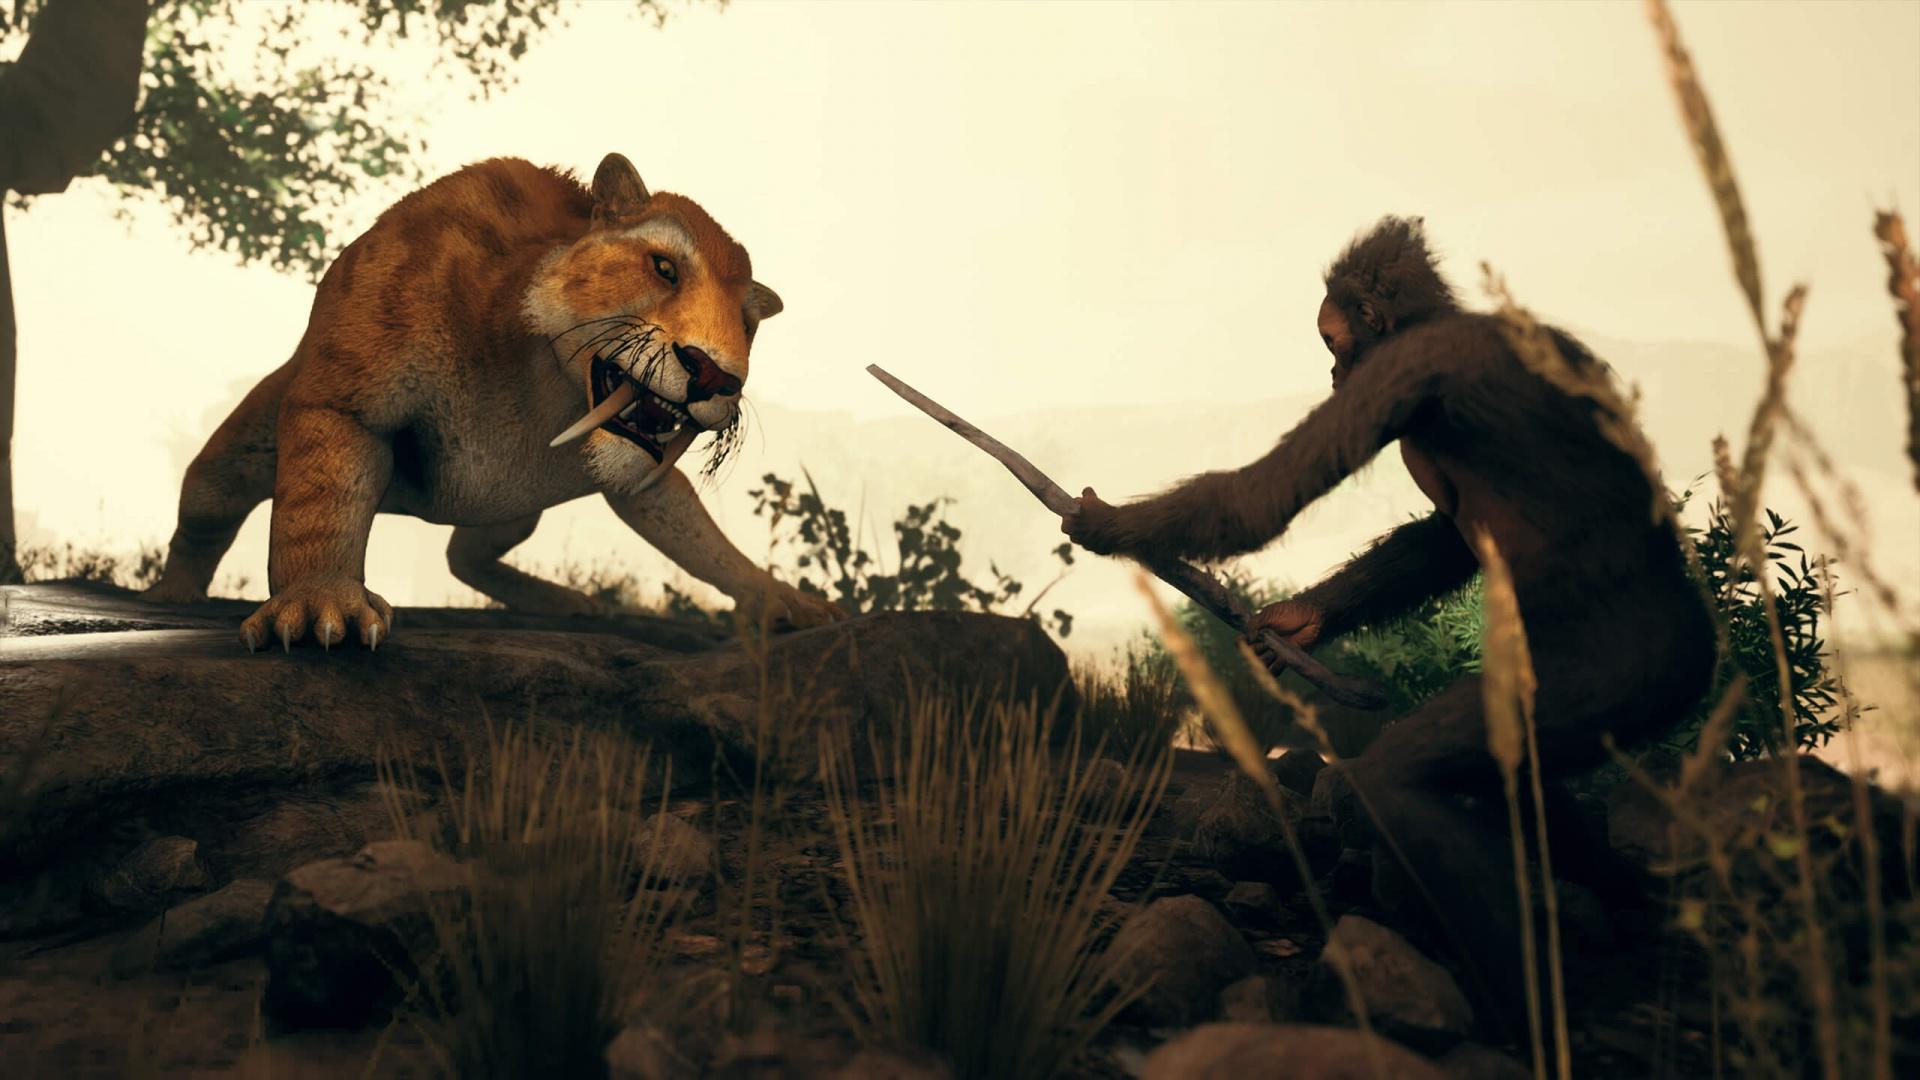 Противоречивая Ancestors: The Humankind Odyssey выйдет на PS4 и Xbox One уже6 декабря